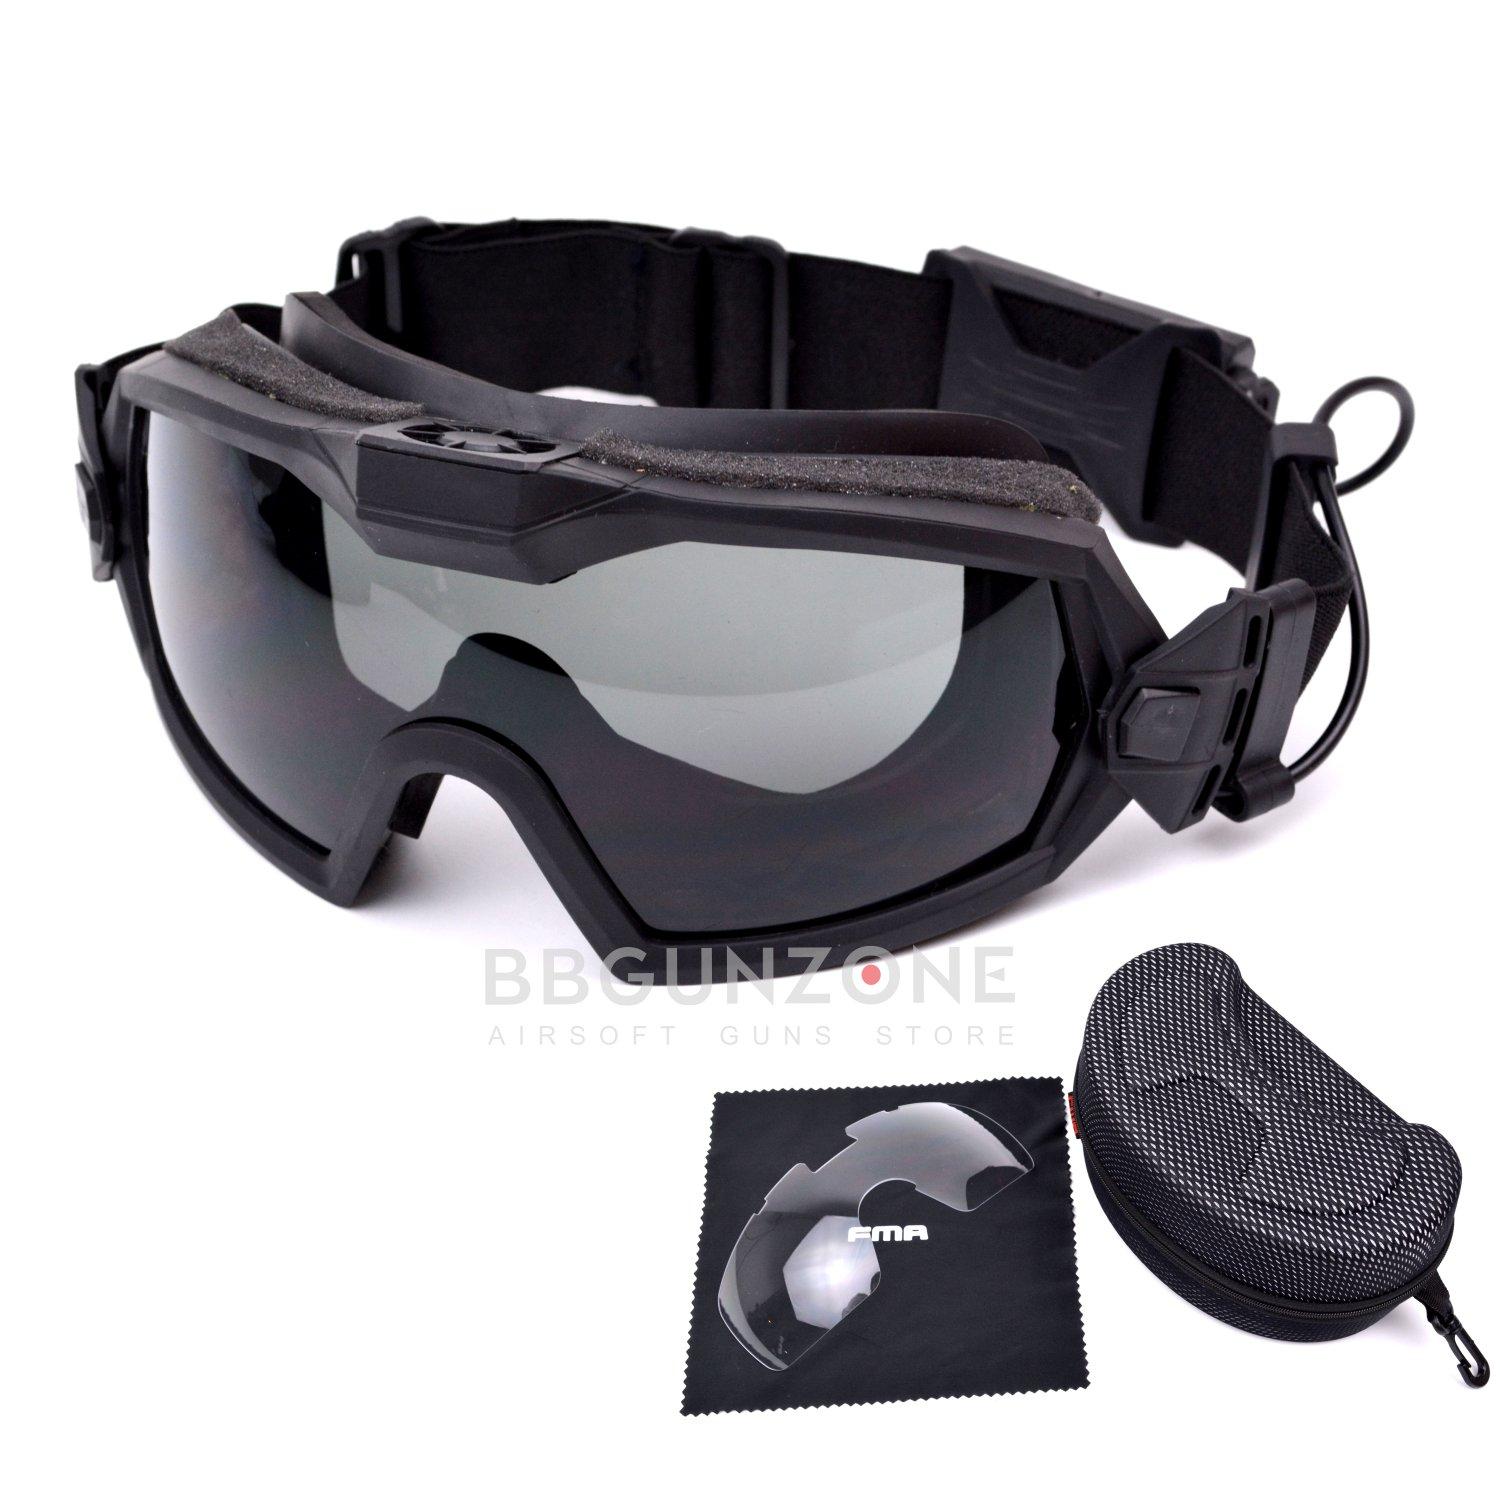 FMA แว่น Pro Goggle มีพัดลม